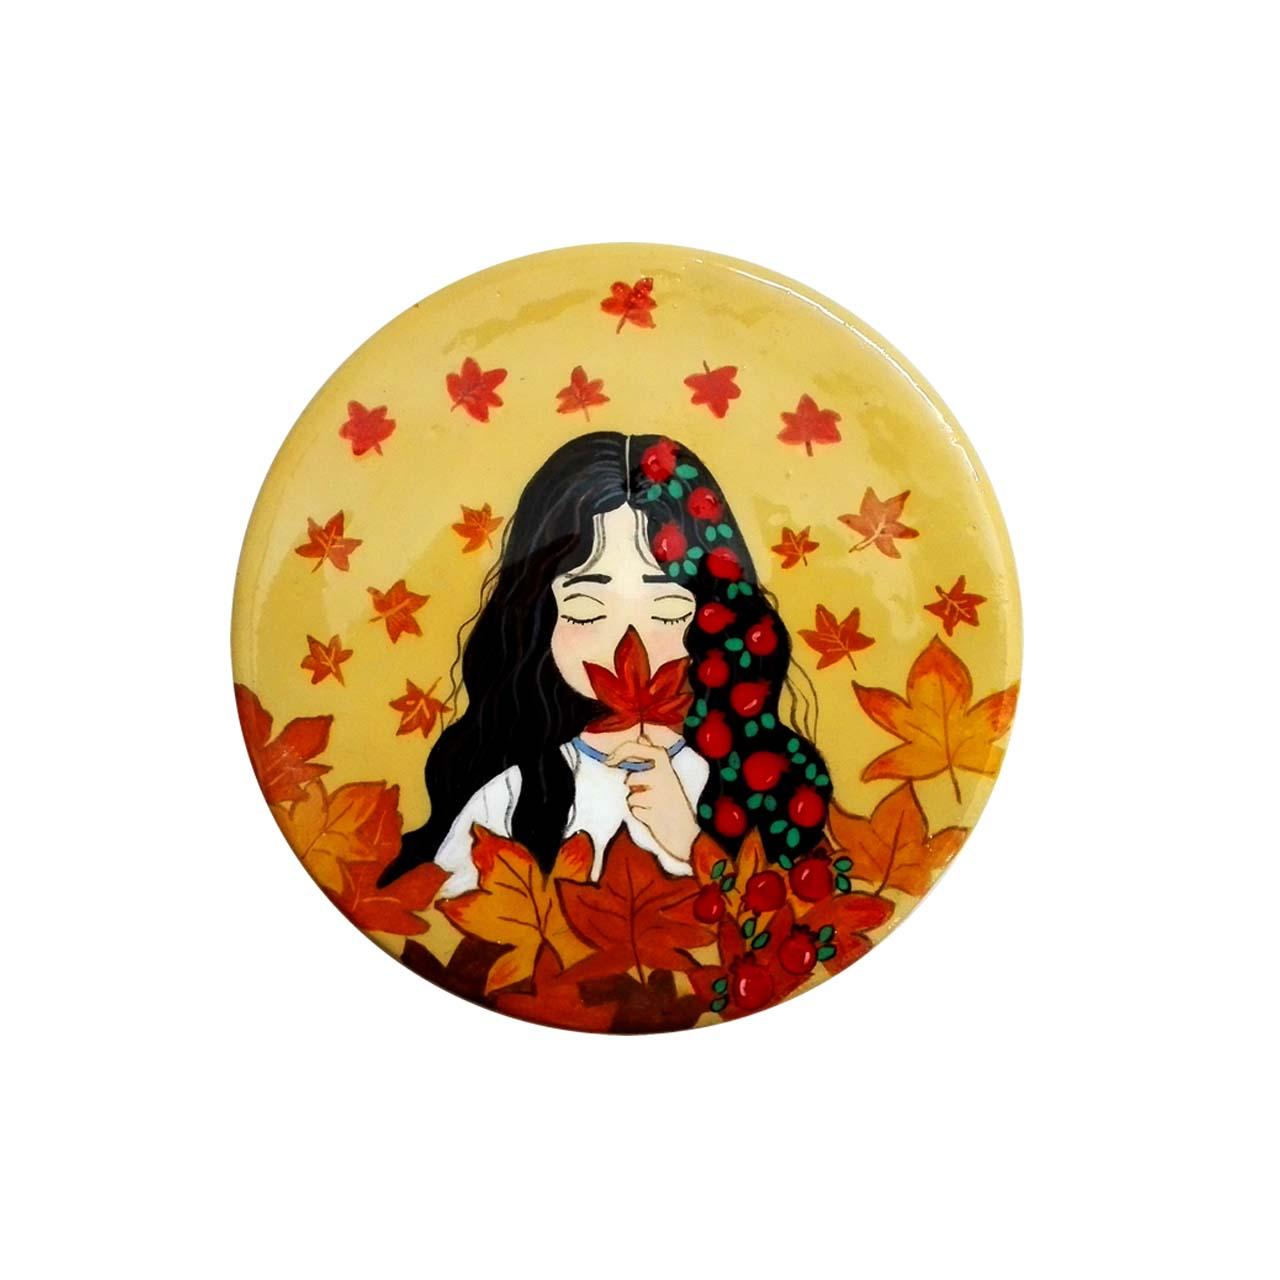 بشقاب سفالی طرح نقاشی دختر پاییز کد 14575